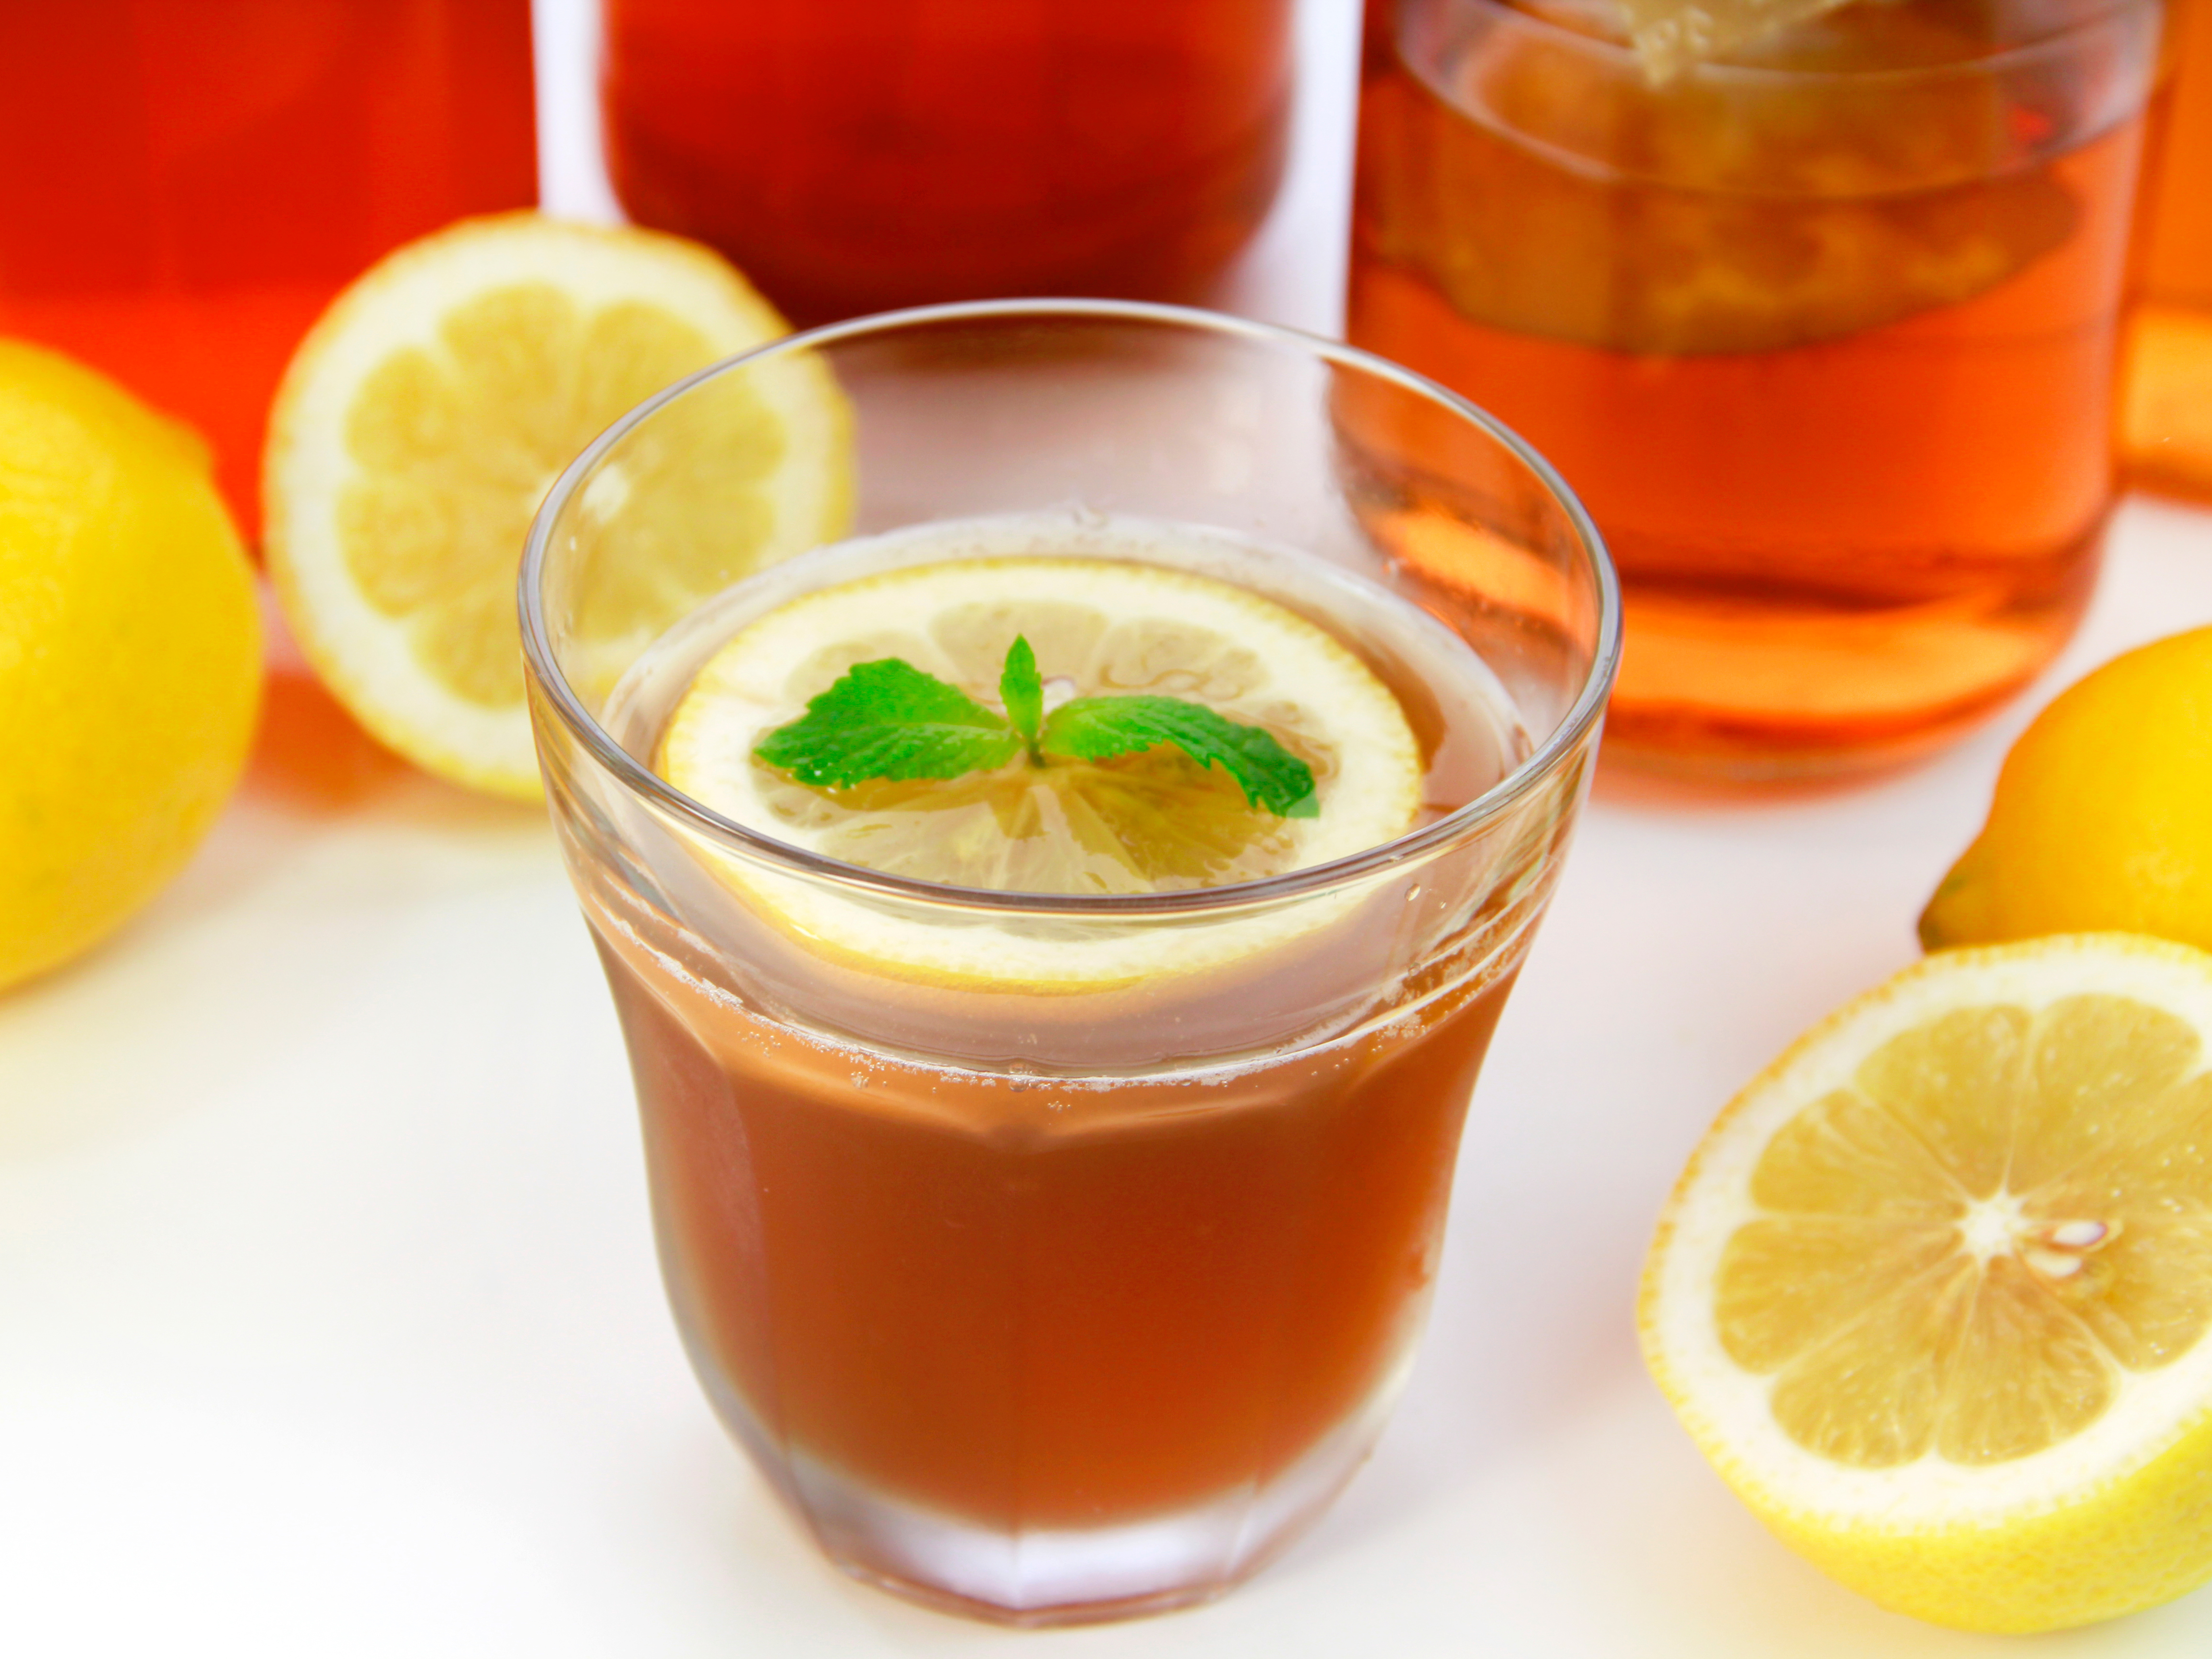 11 facts about mysterious, medicinal kombucha tea